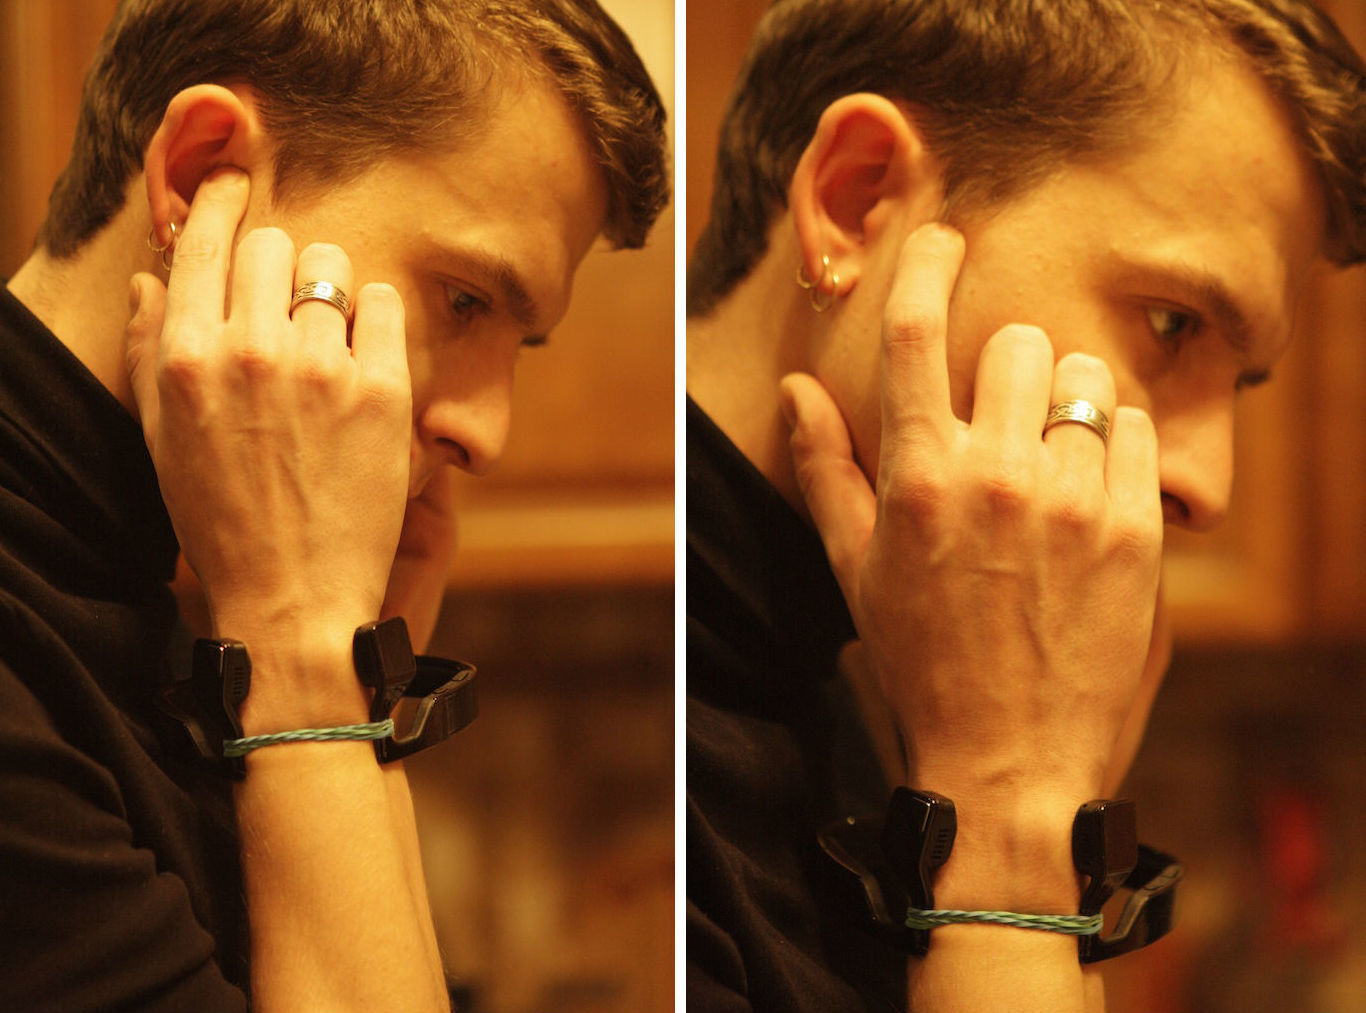 Как слушать музыку через палец - 5